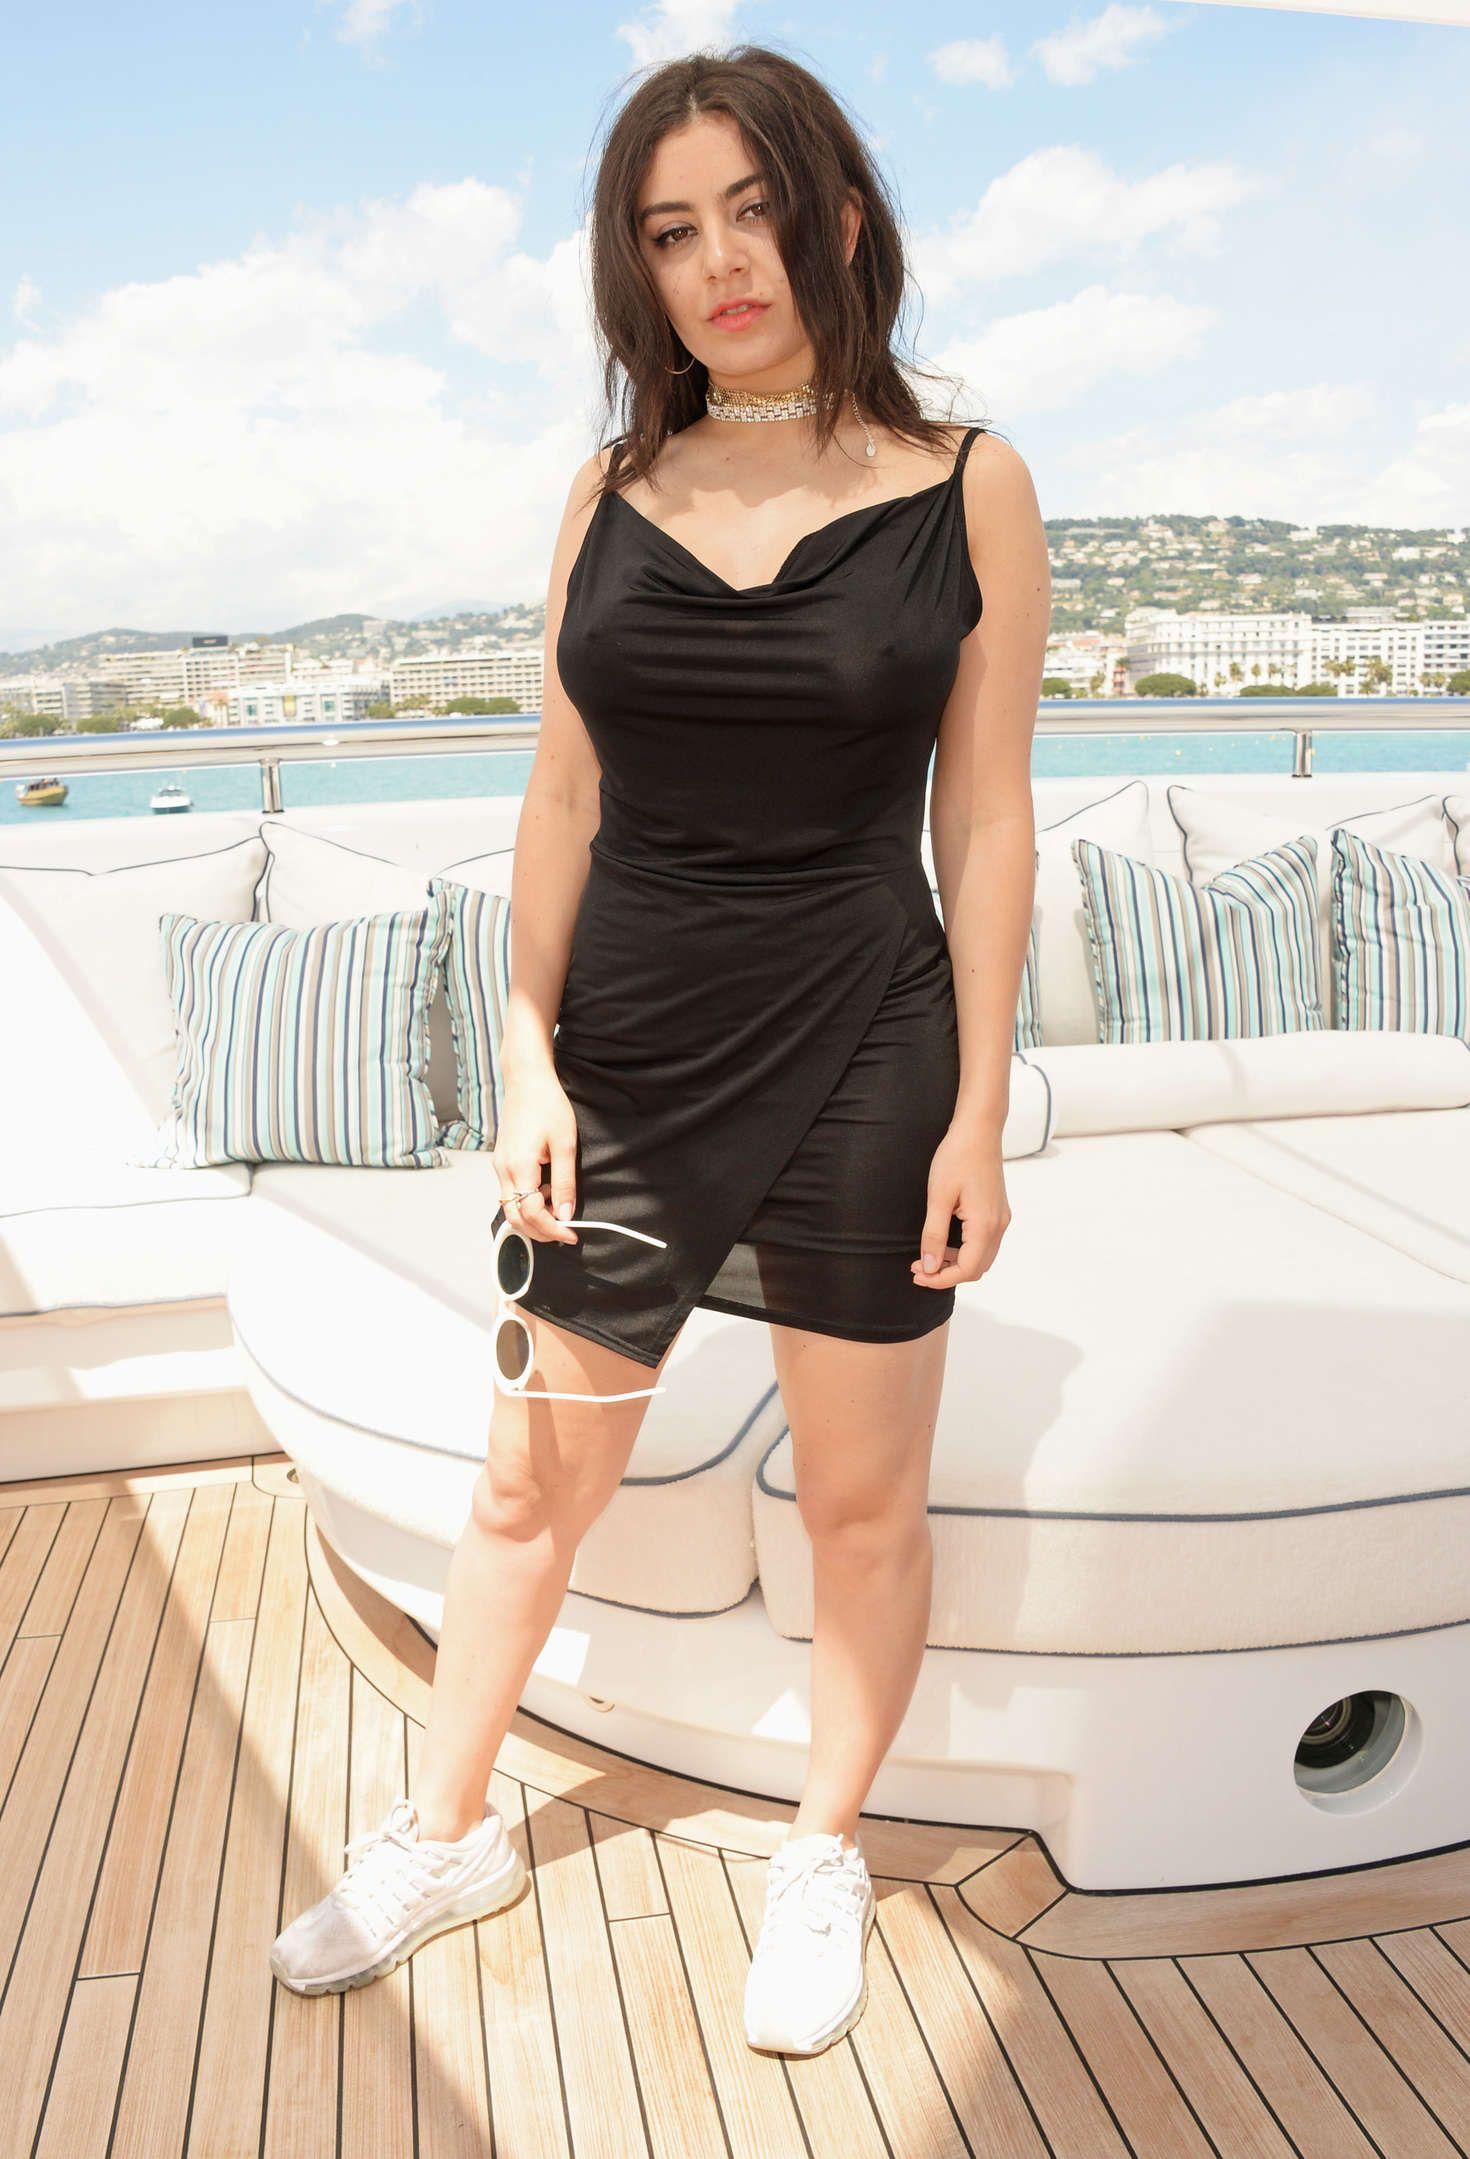 Sexy Pics of Charli XCX